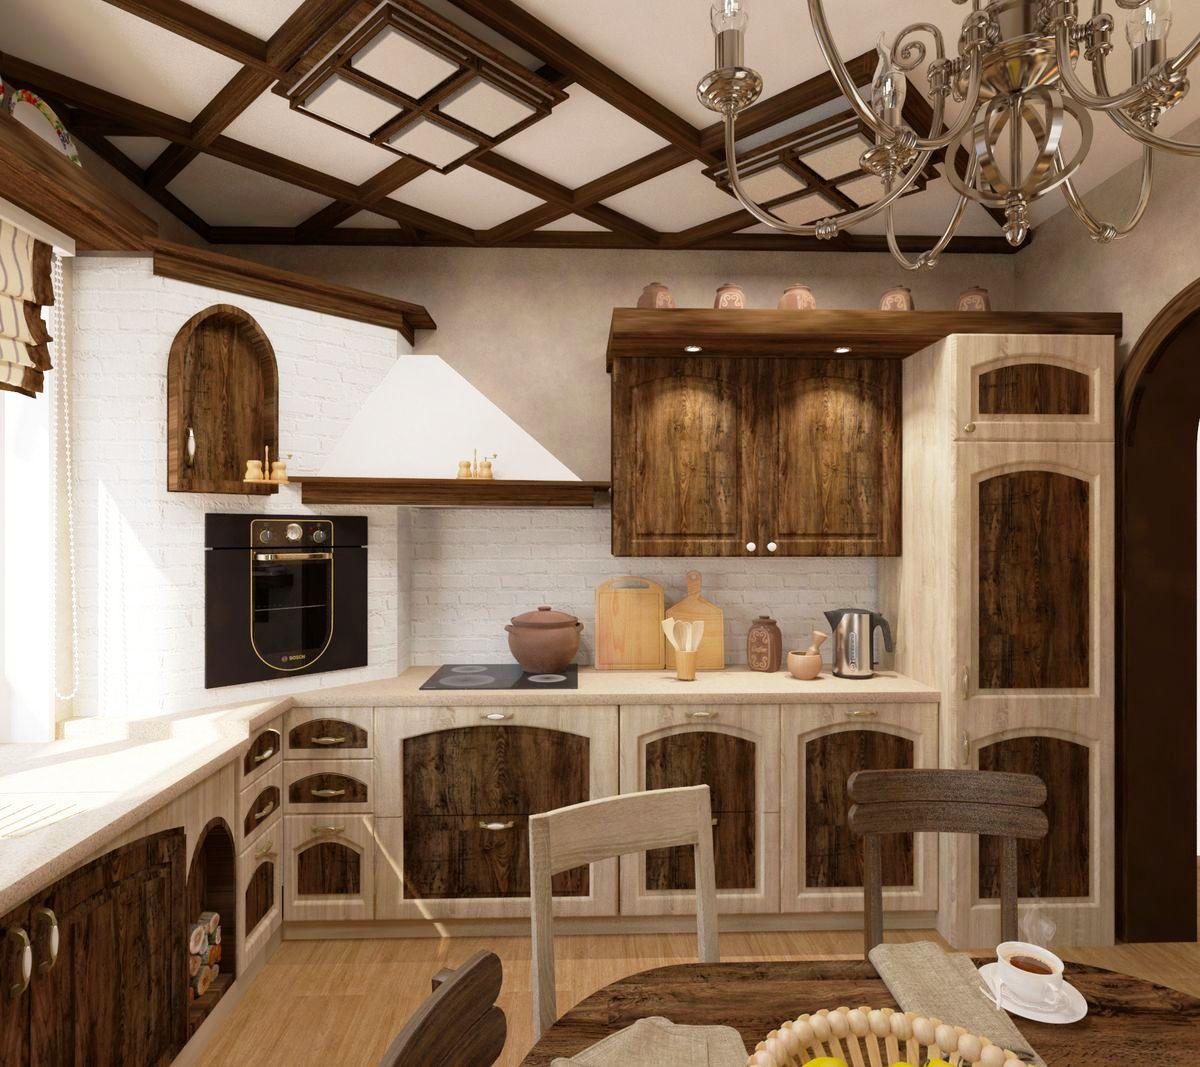 дизайн кухни в стиле шале фото училище, несмотря